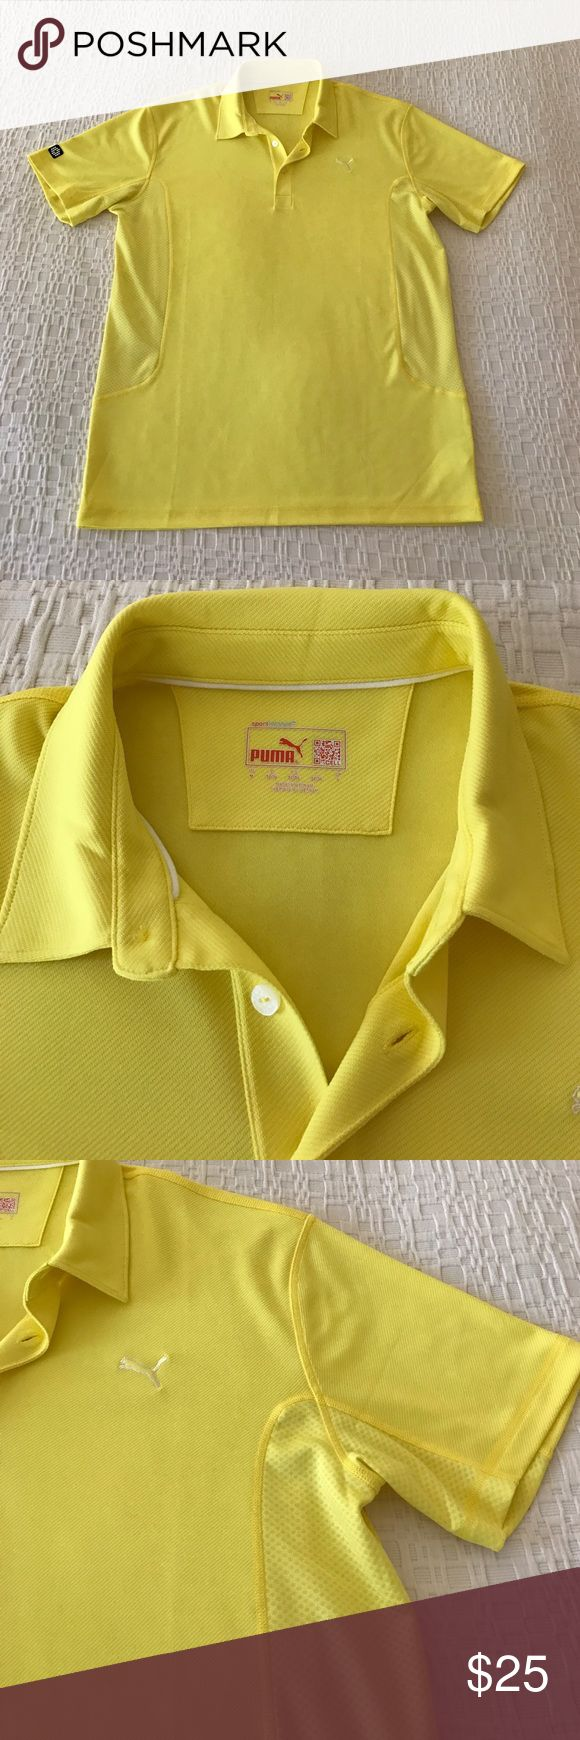 Men's Puma sport lifestyle yellow golf shirt. Puma Golf collared shirt. Moisture wicking material. Like new. Puma Shirts Polos